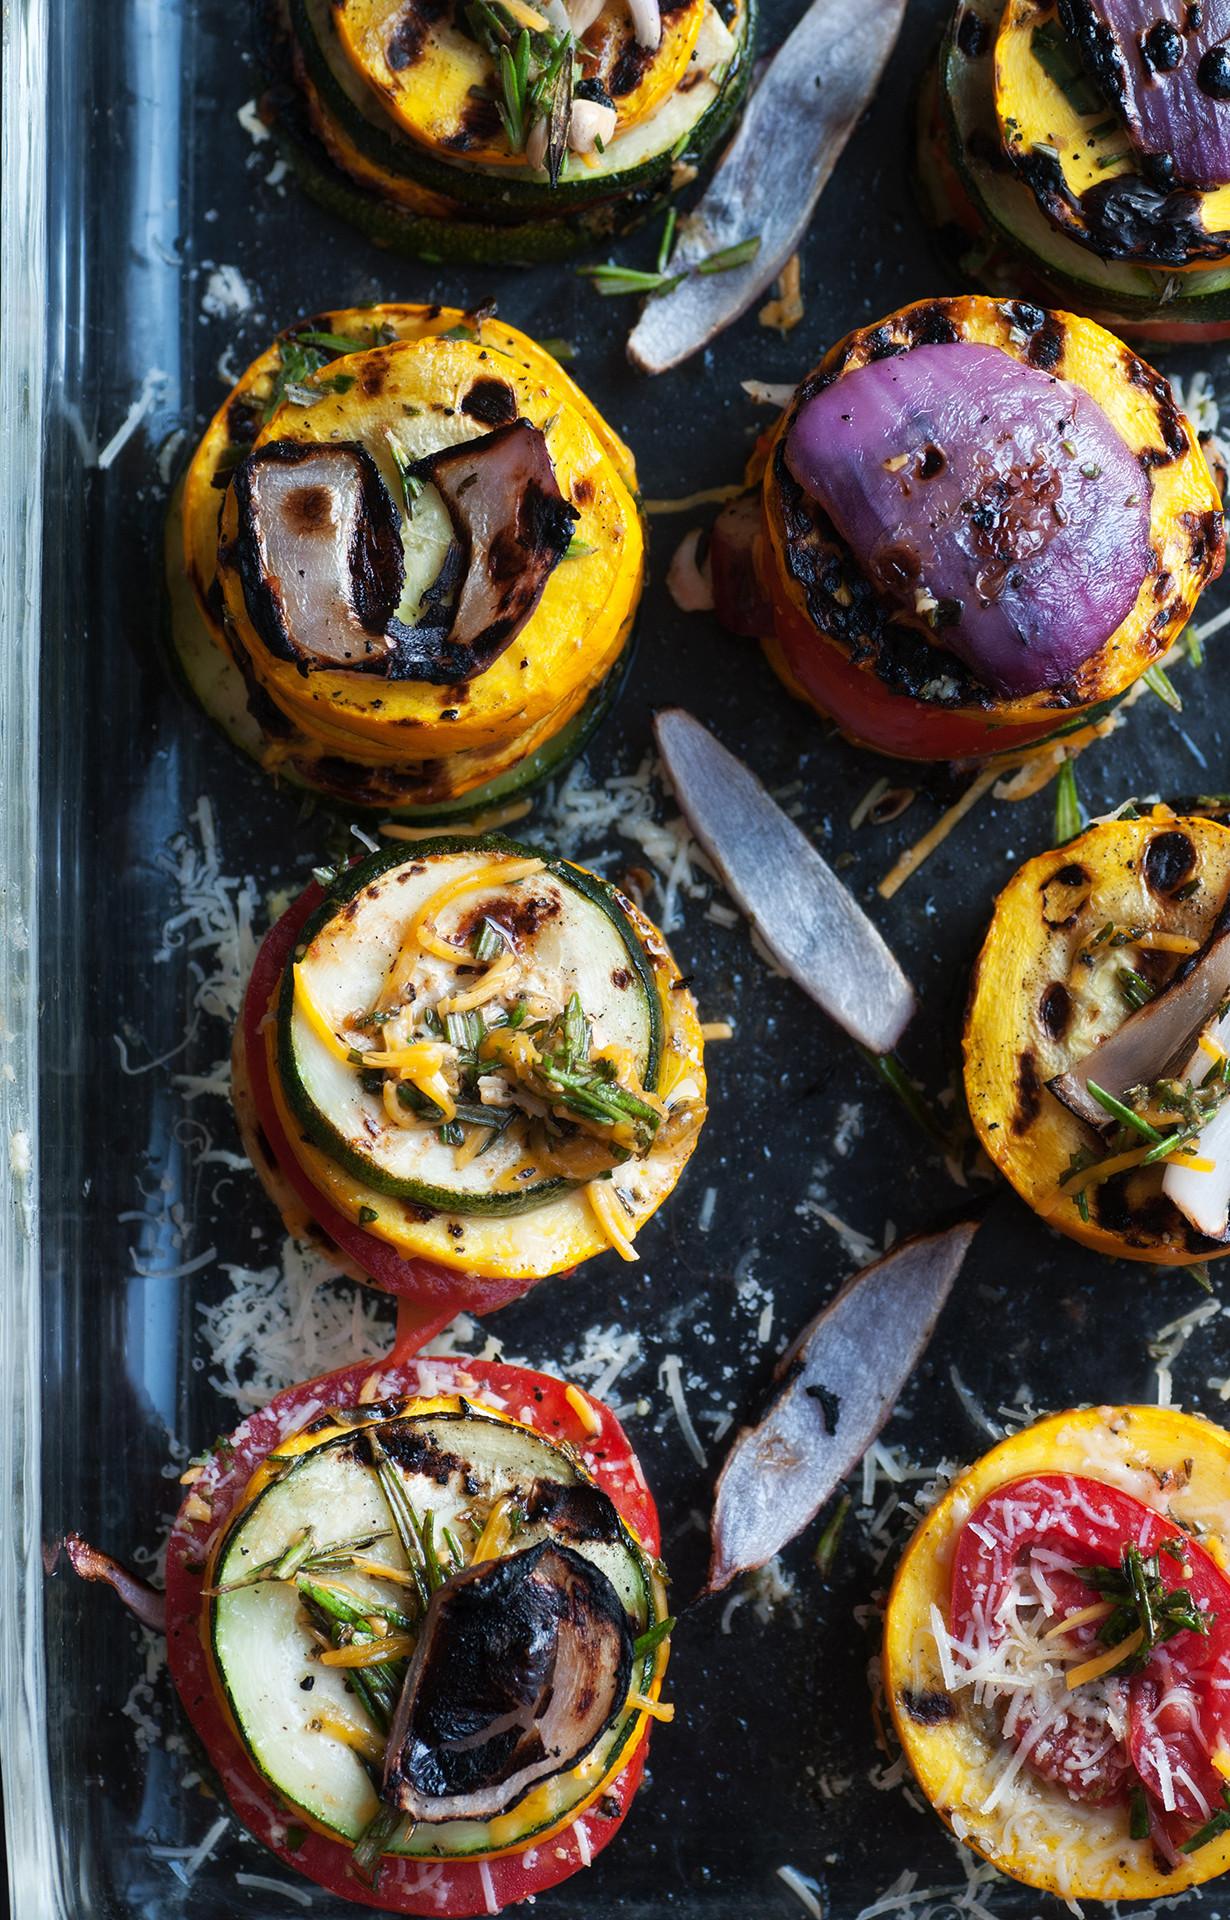 Mediterrane vegane Küche